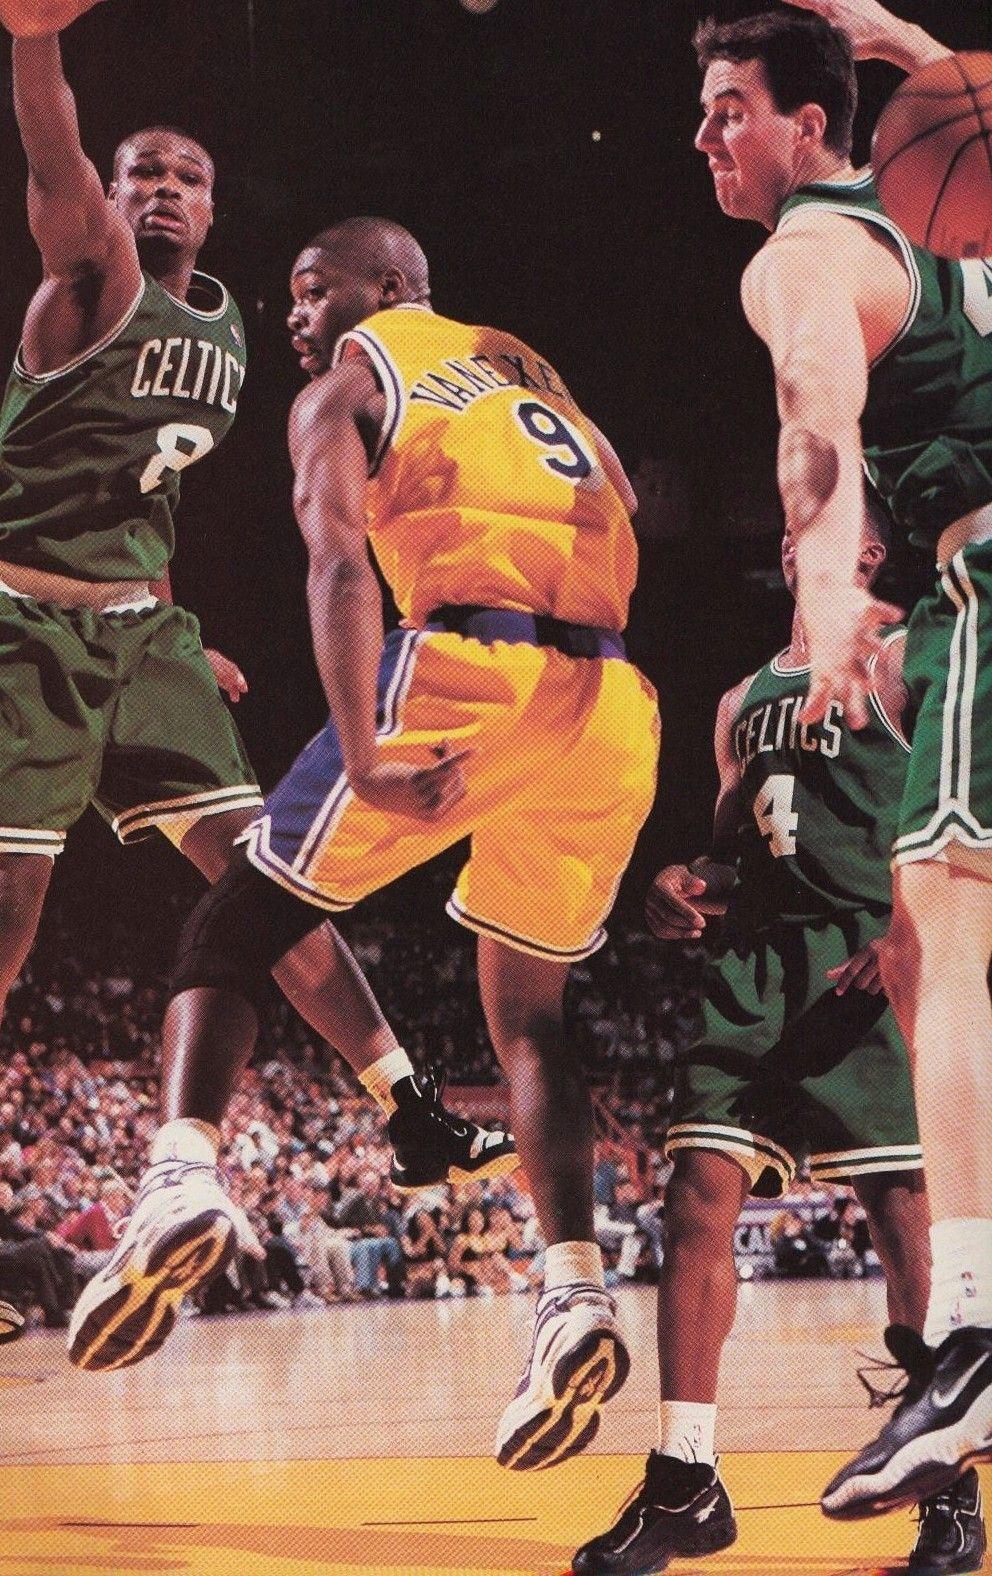 Van Exel Passes Out A Crowd, '98. Nba legends, Inside